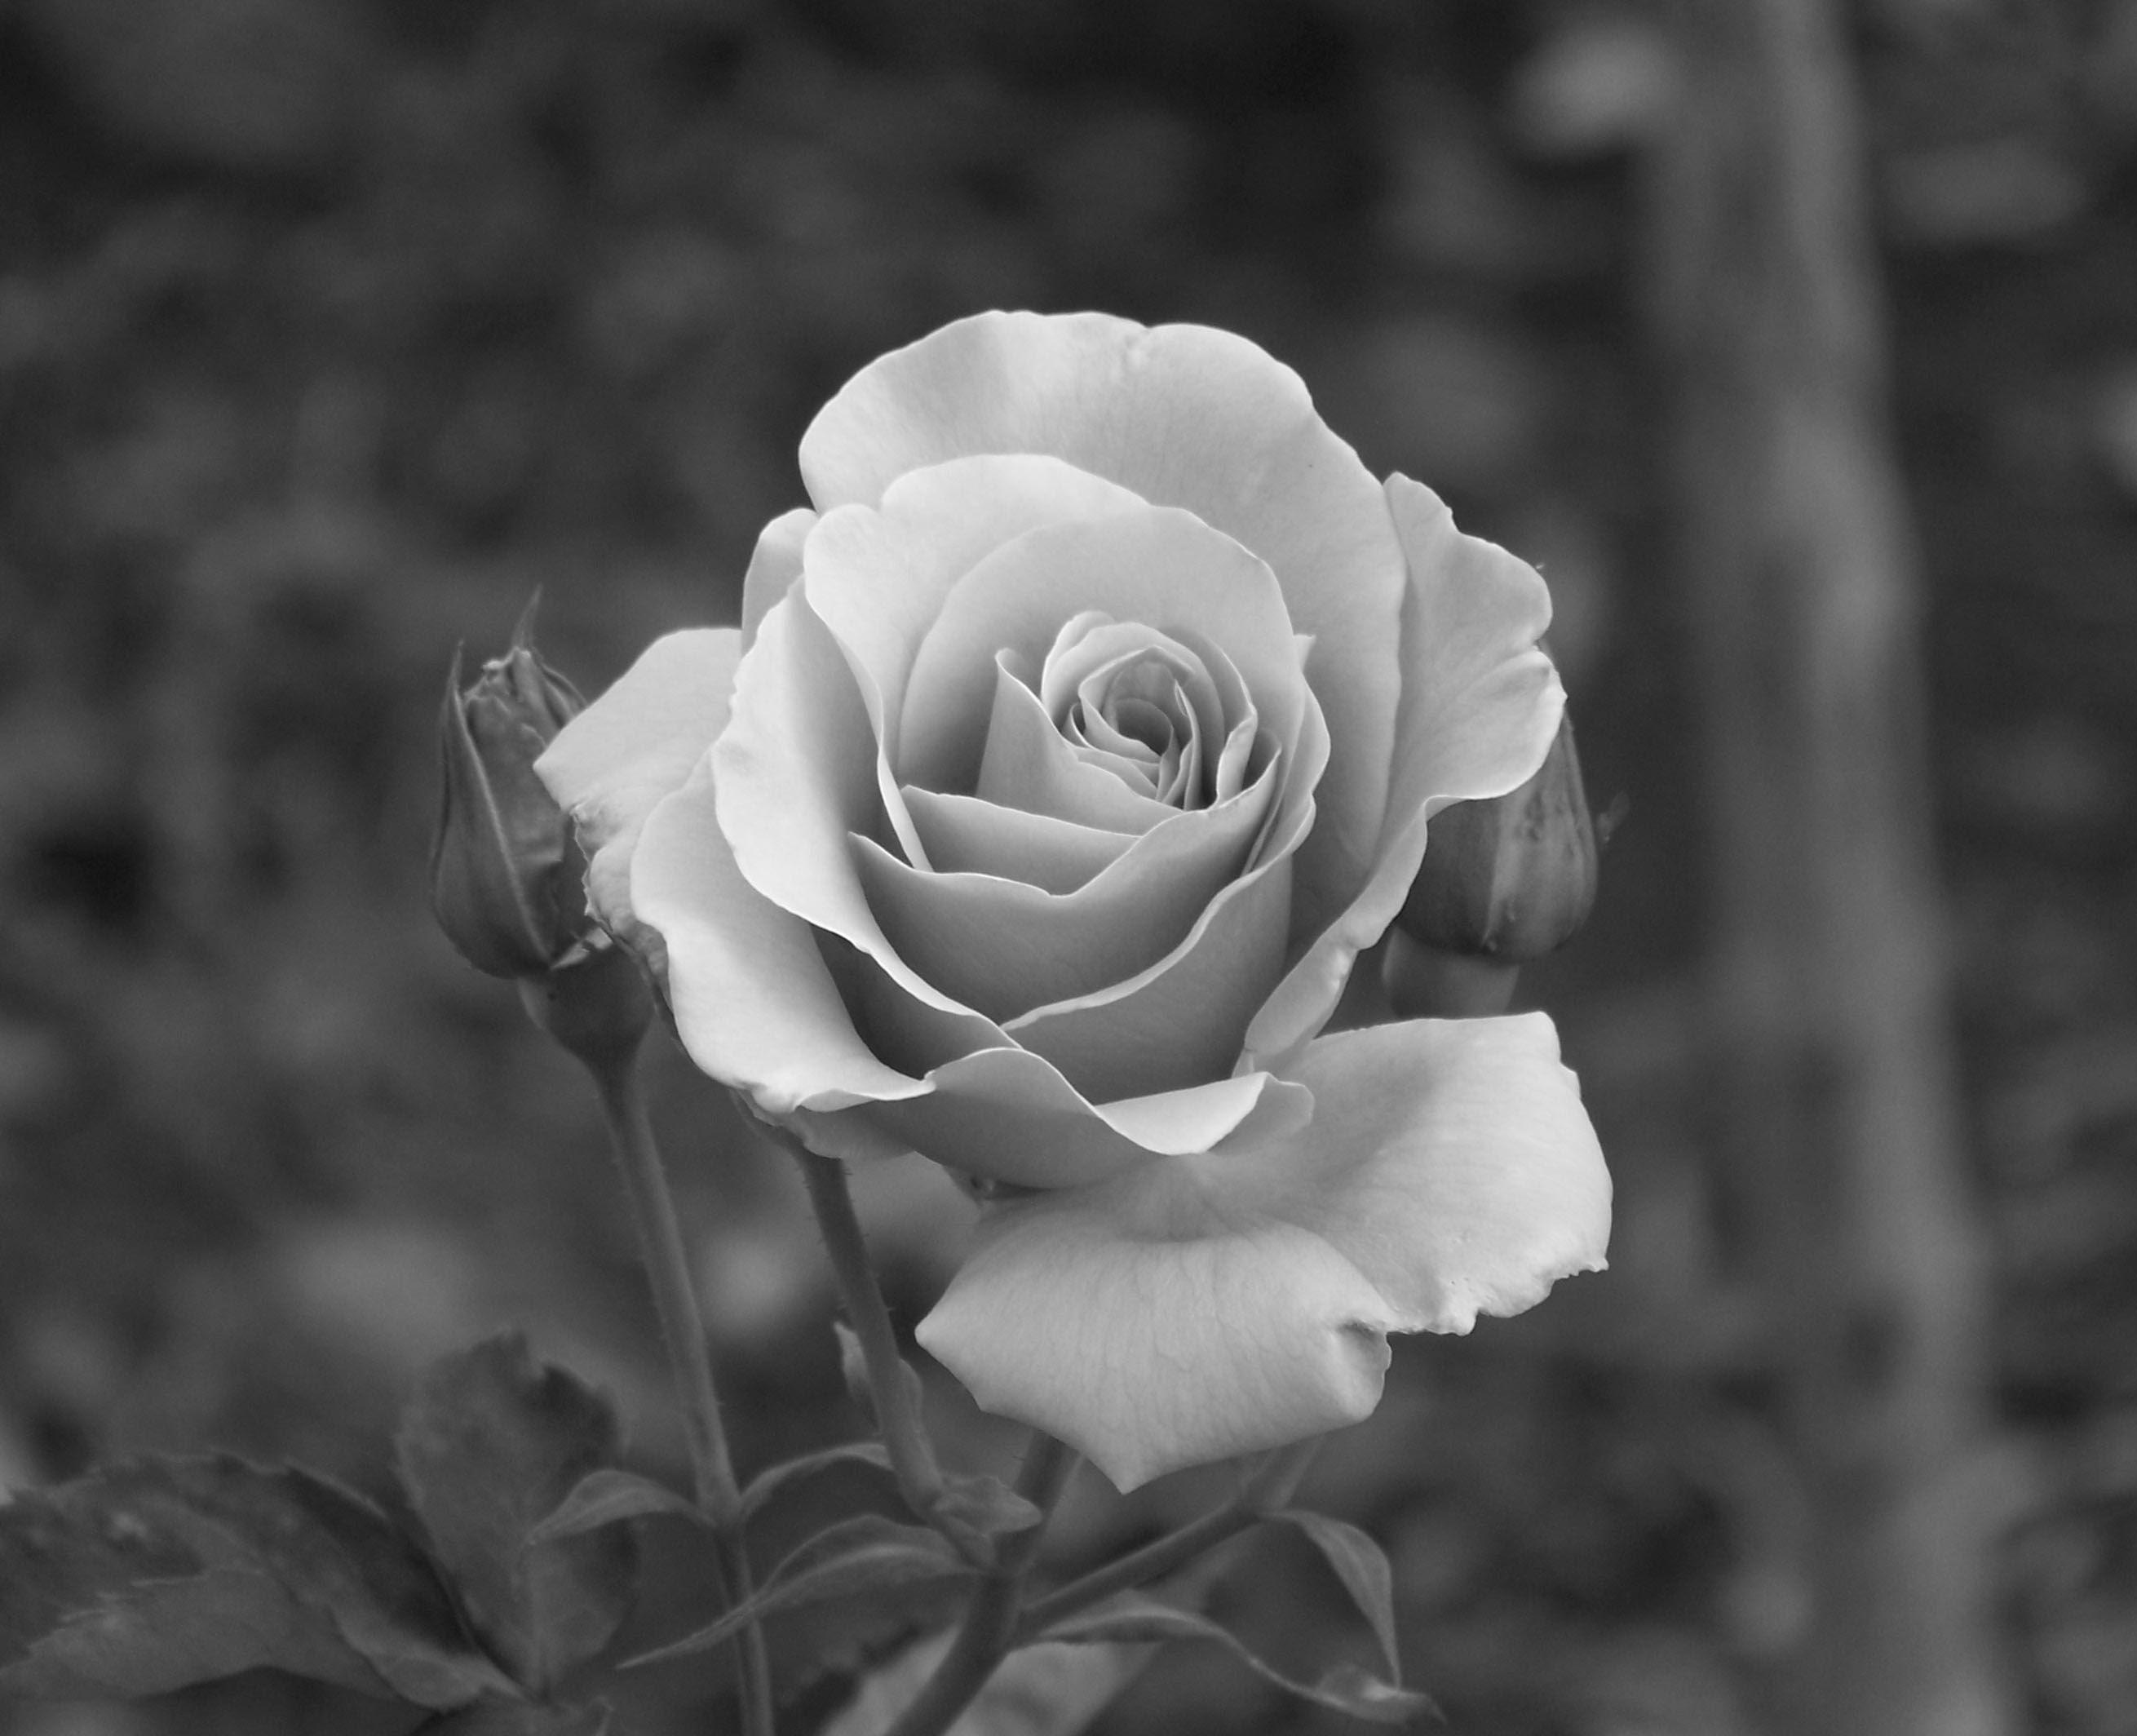 rose photography Black